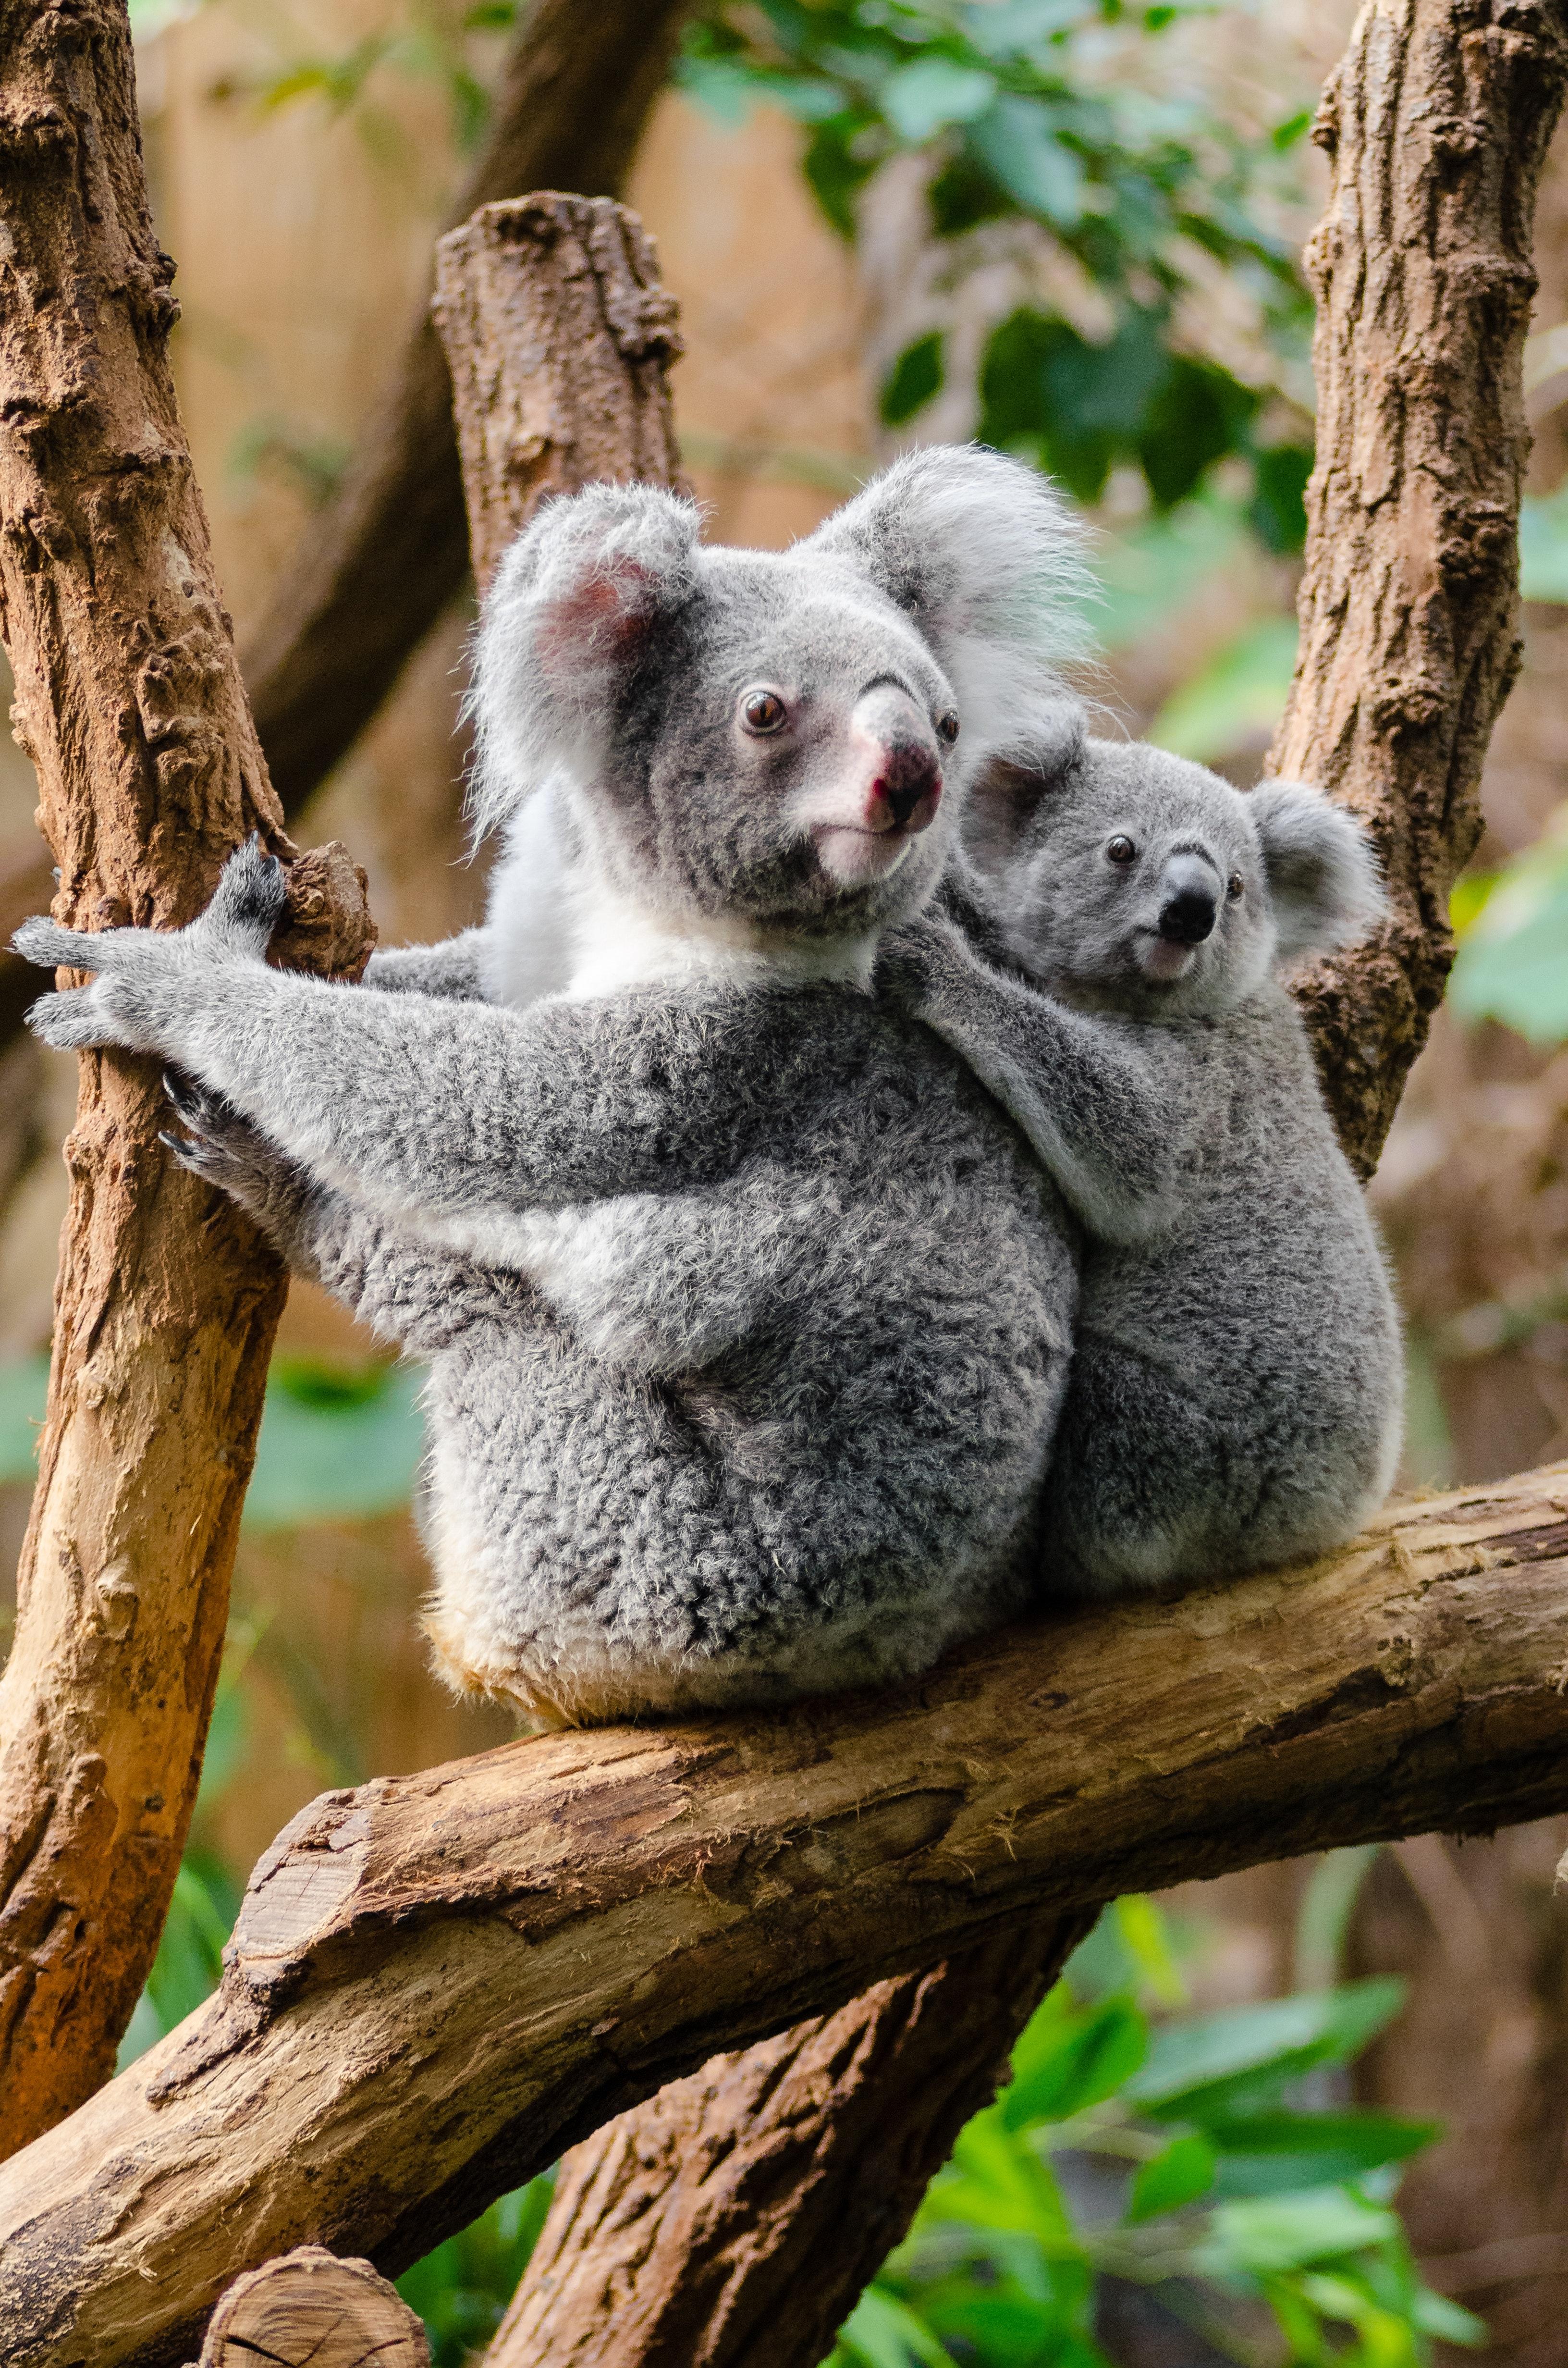 Grey and White Koala B...